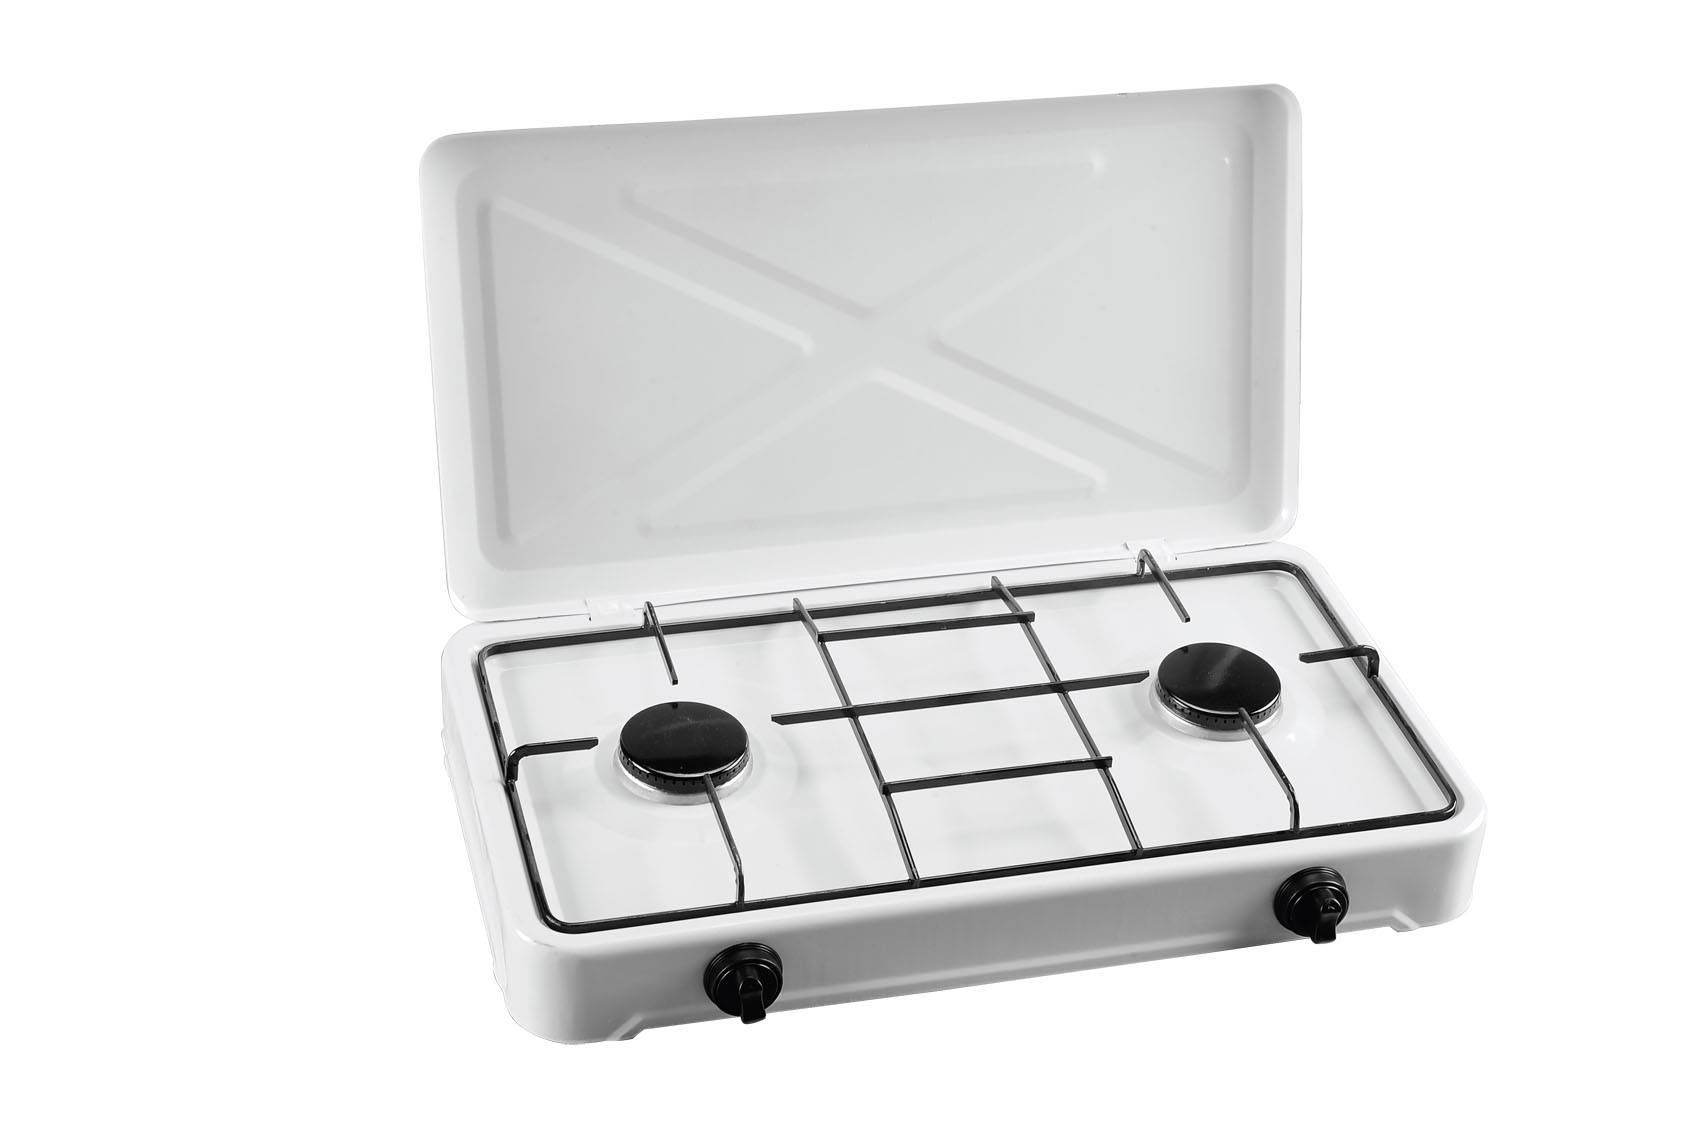 simple gas stove 2 burners